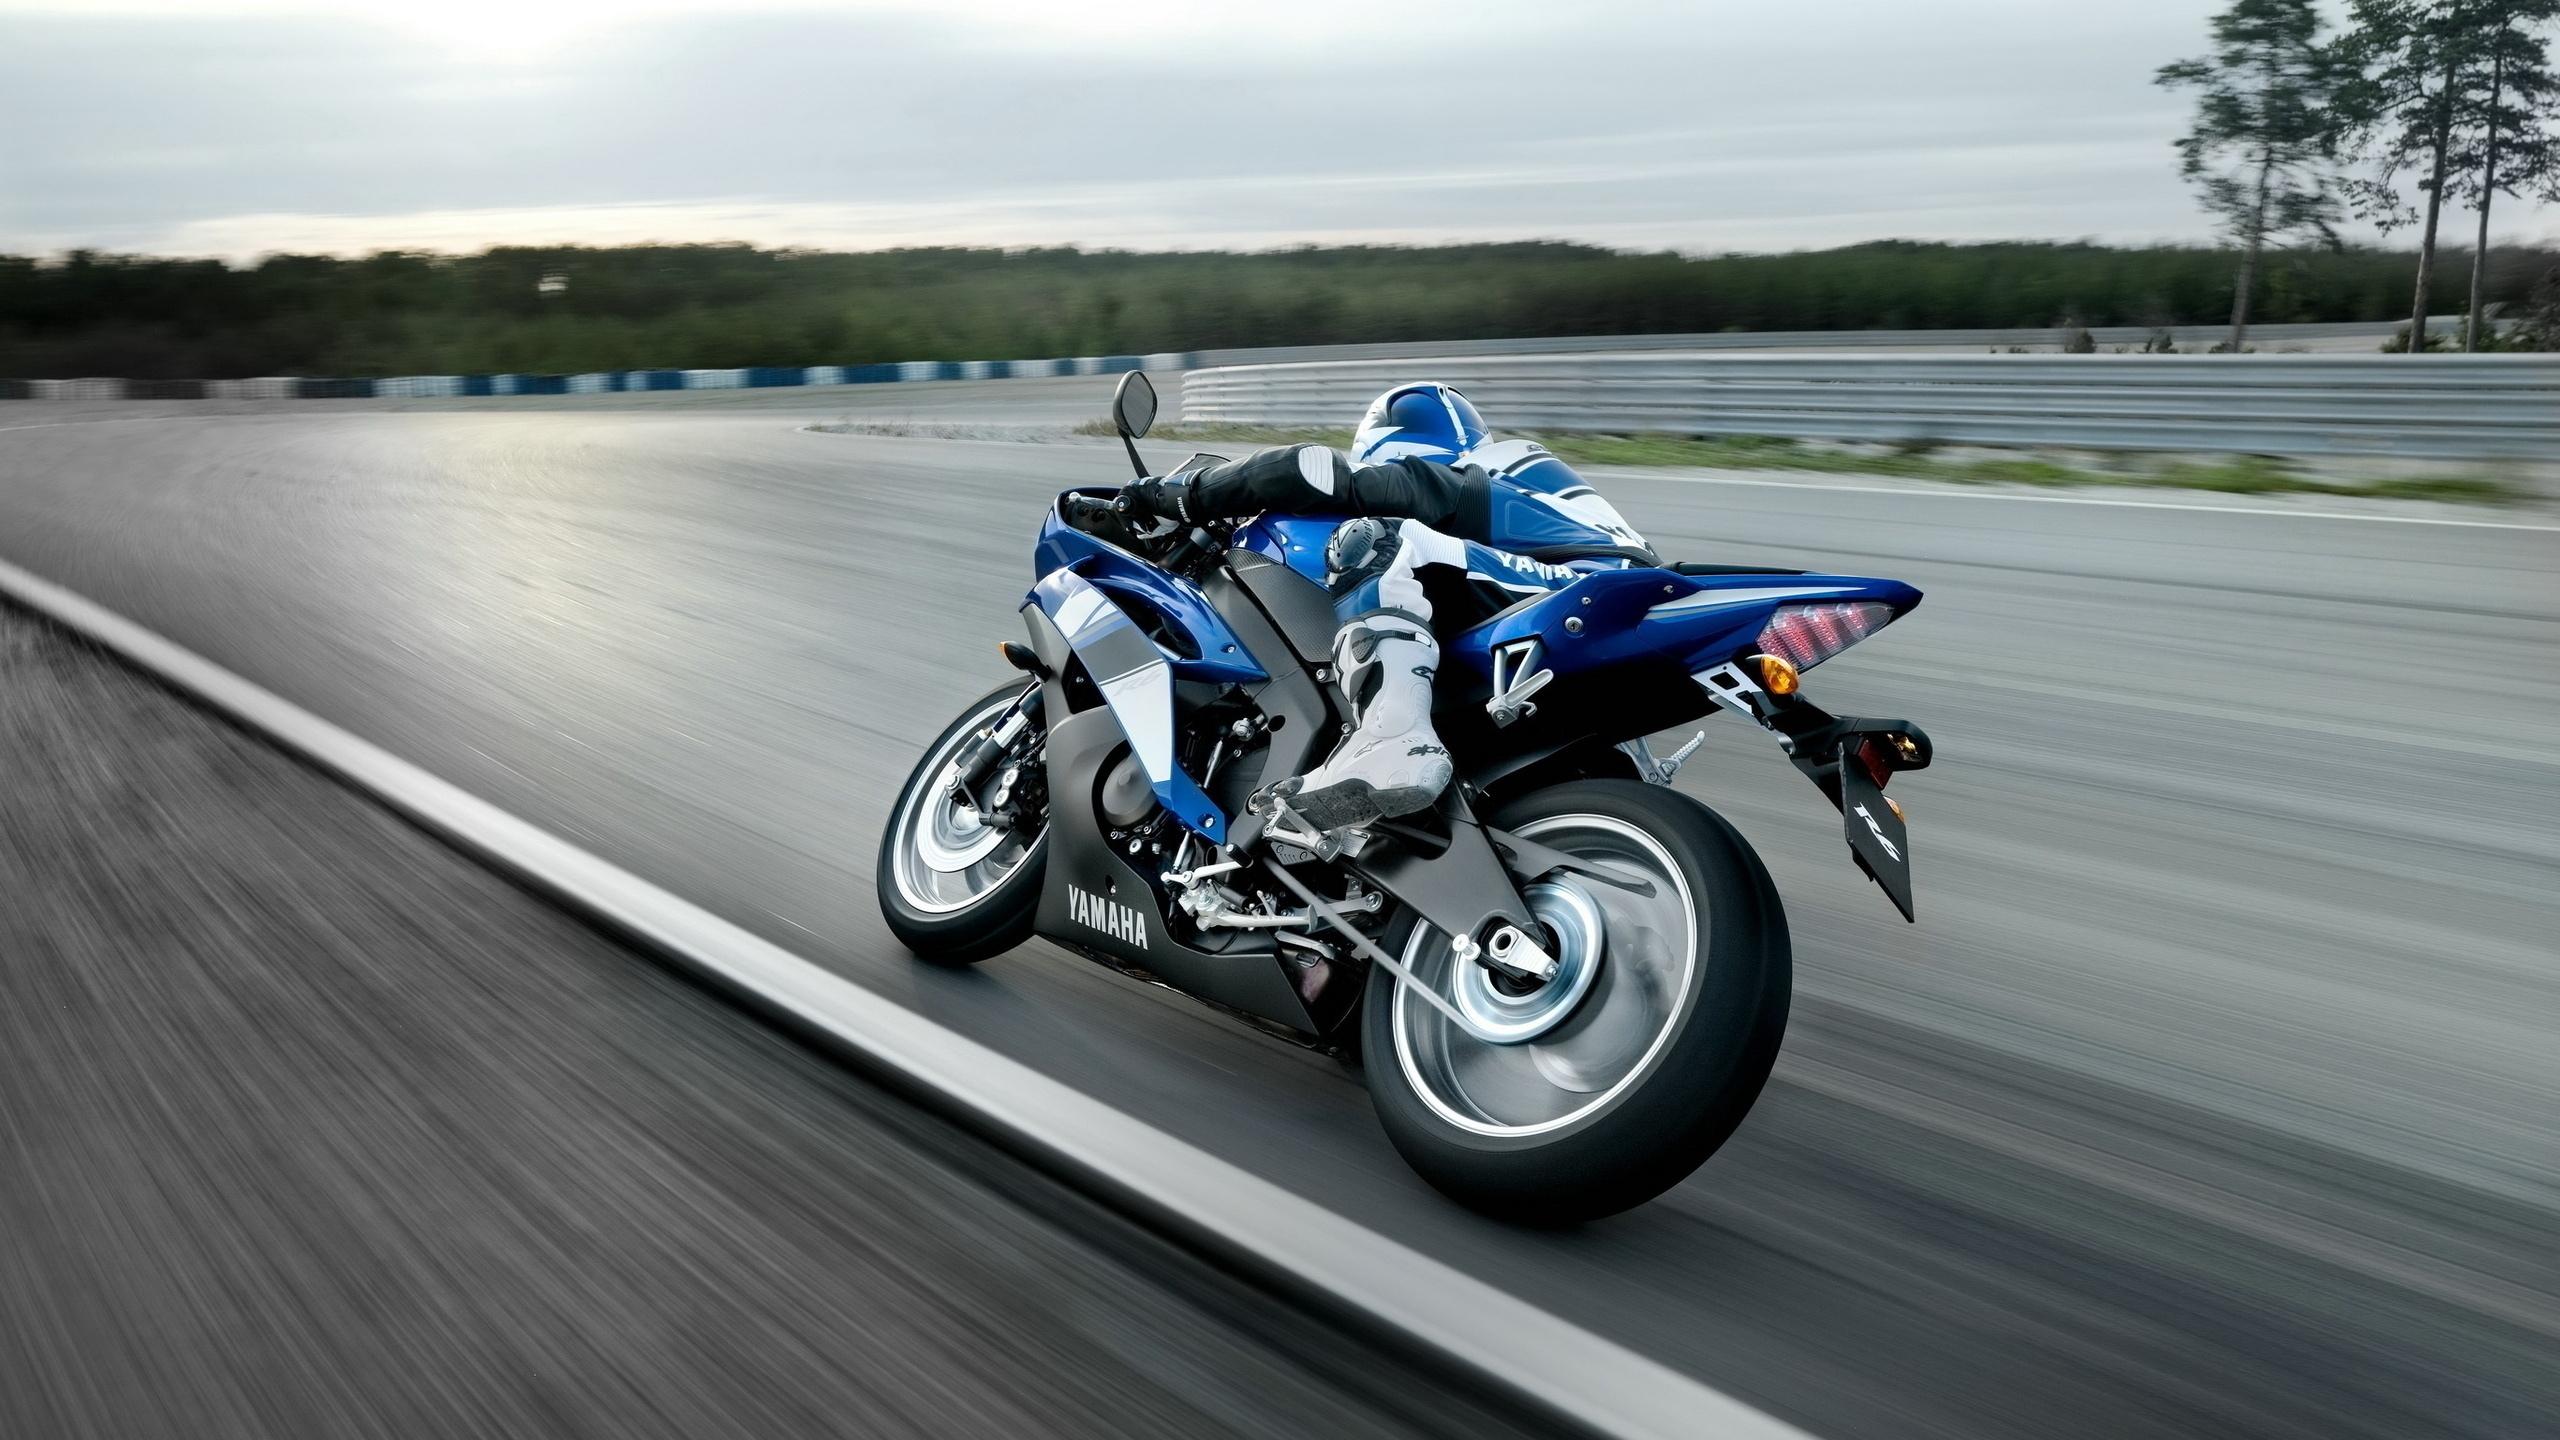 Image: Bike, Yamaha, speed, rotation, rider, blue, blur, track, racing track